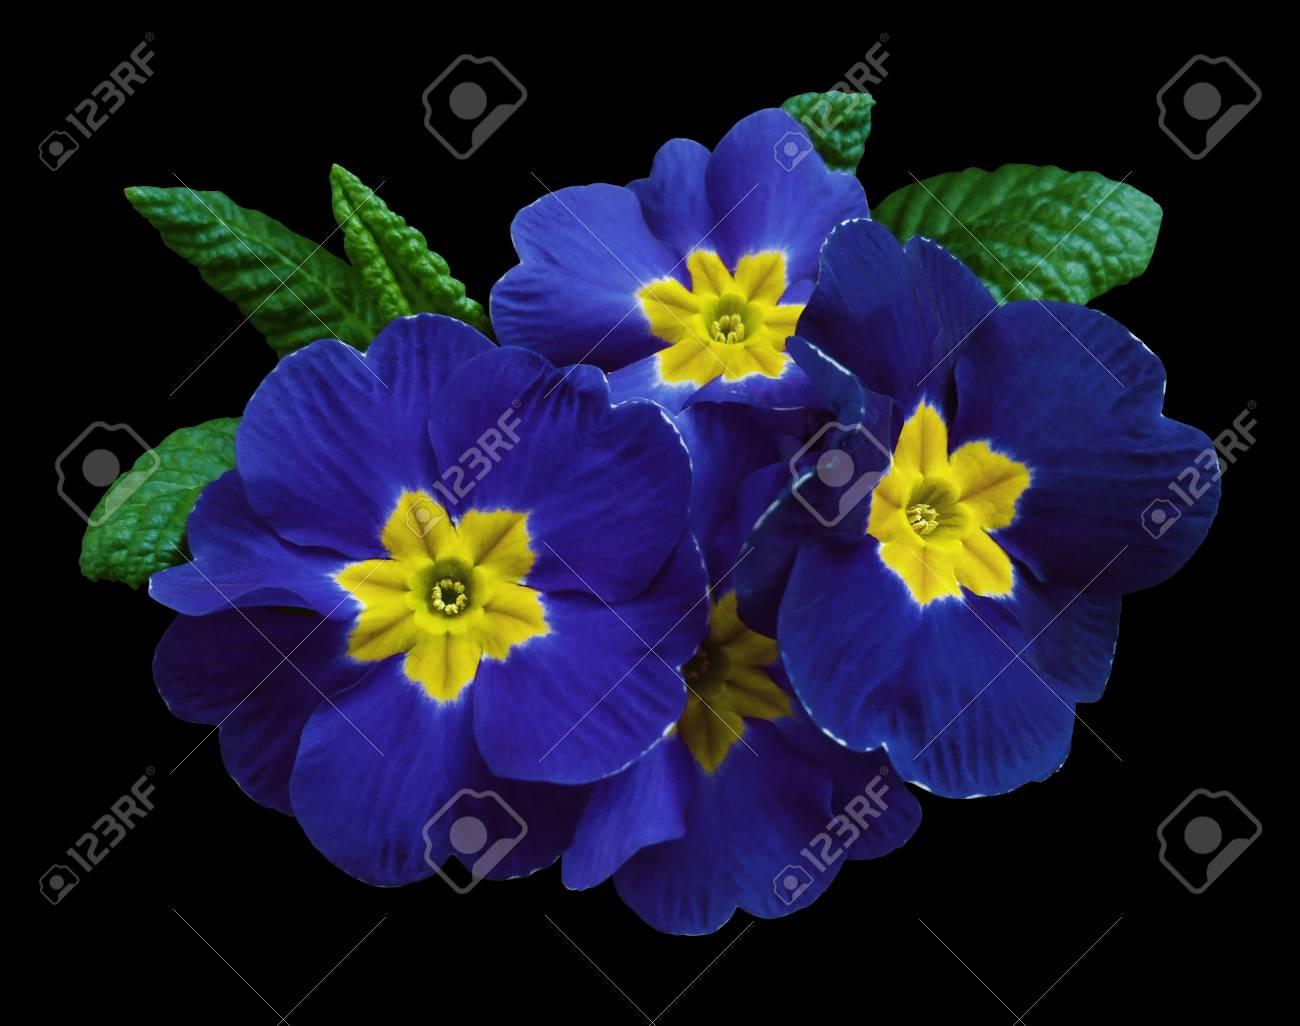 Dark blue violets flowers black isolated background with clipping dark blue violets flowers black isolated background with clipping path closeup no shadows izmirmasajfo